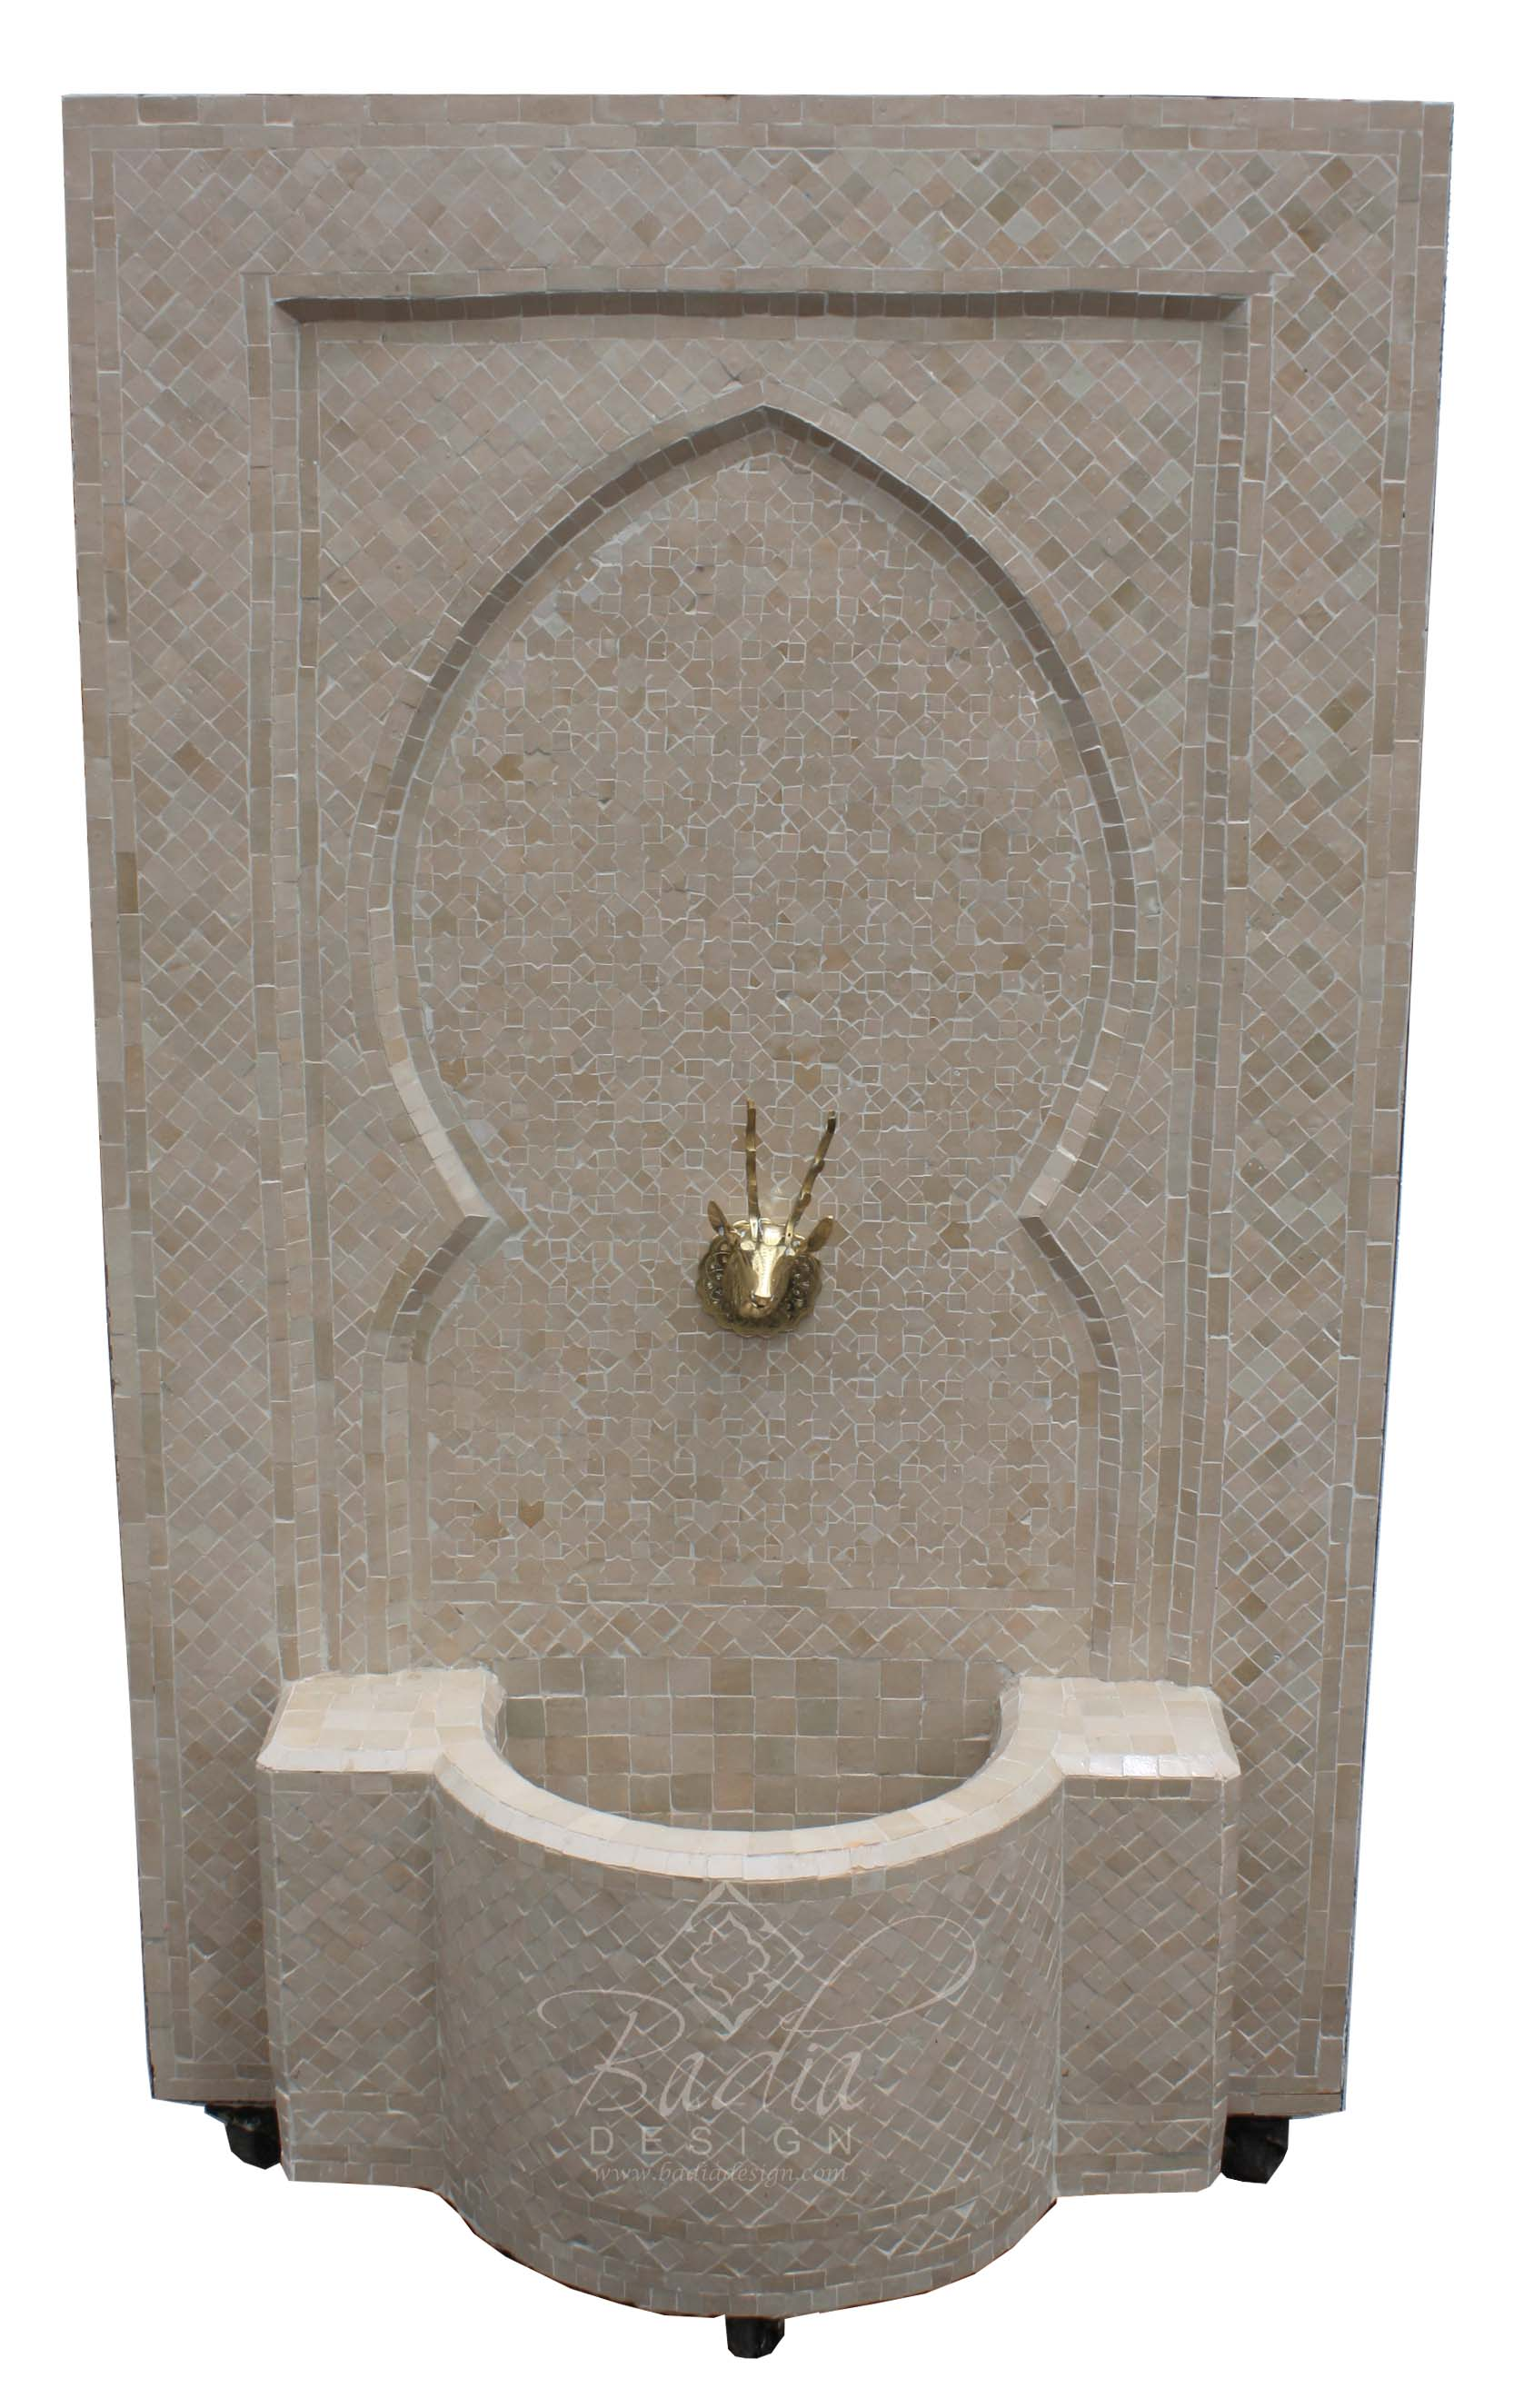 moroccan-tall-mosaic-tile-water-fountain-mf662.jpg